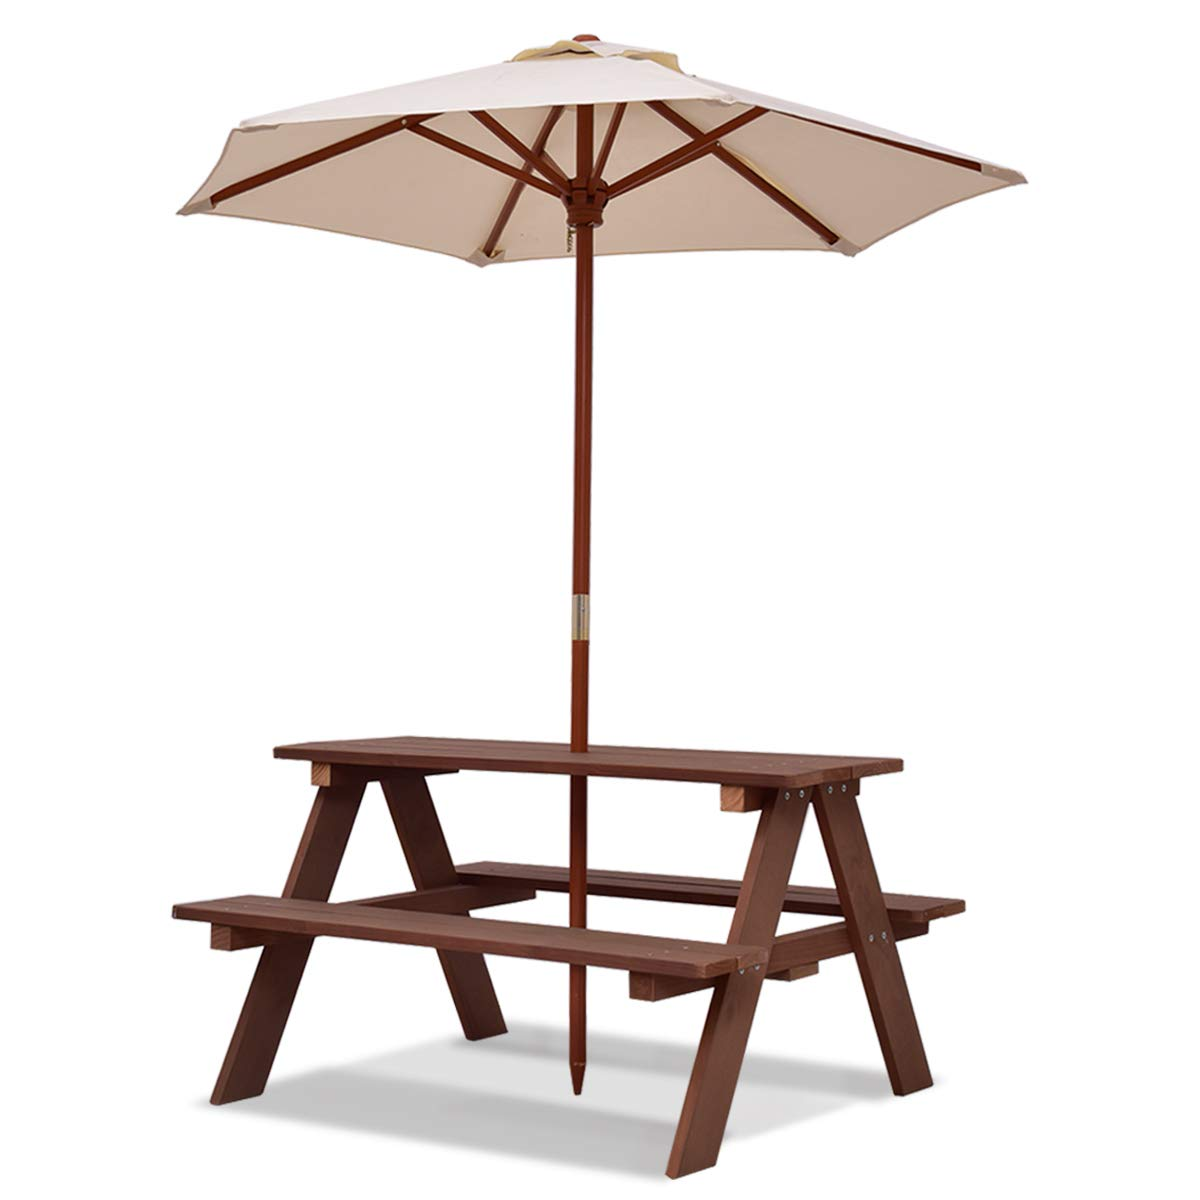 Costzon Kids Picnic Table Set Children Junior Rainbow Bench w/Umbrella (Brown & Beige)